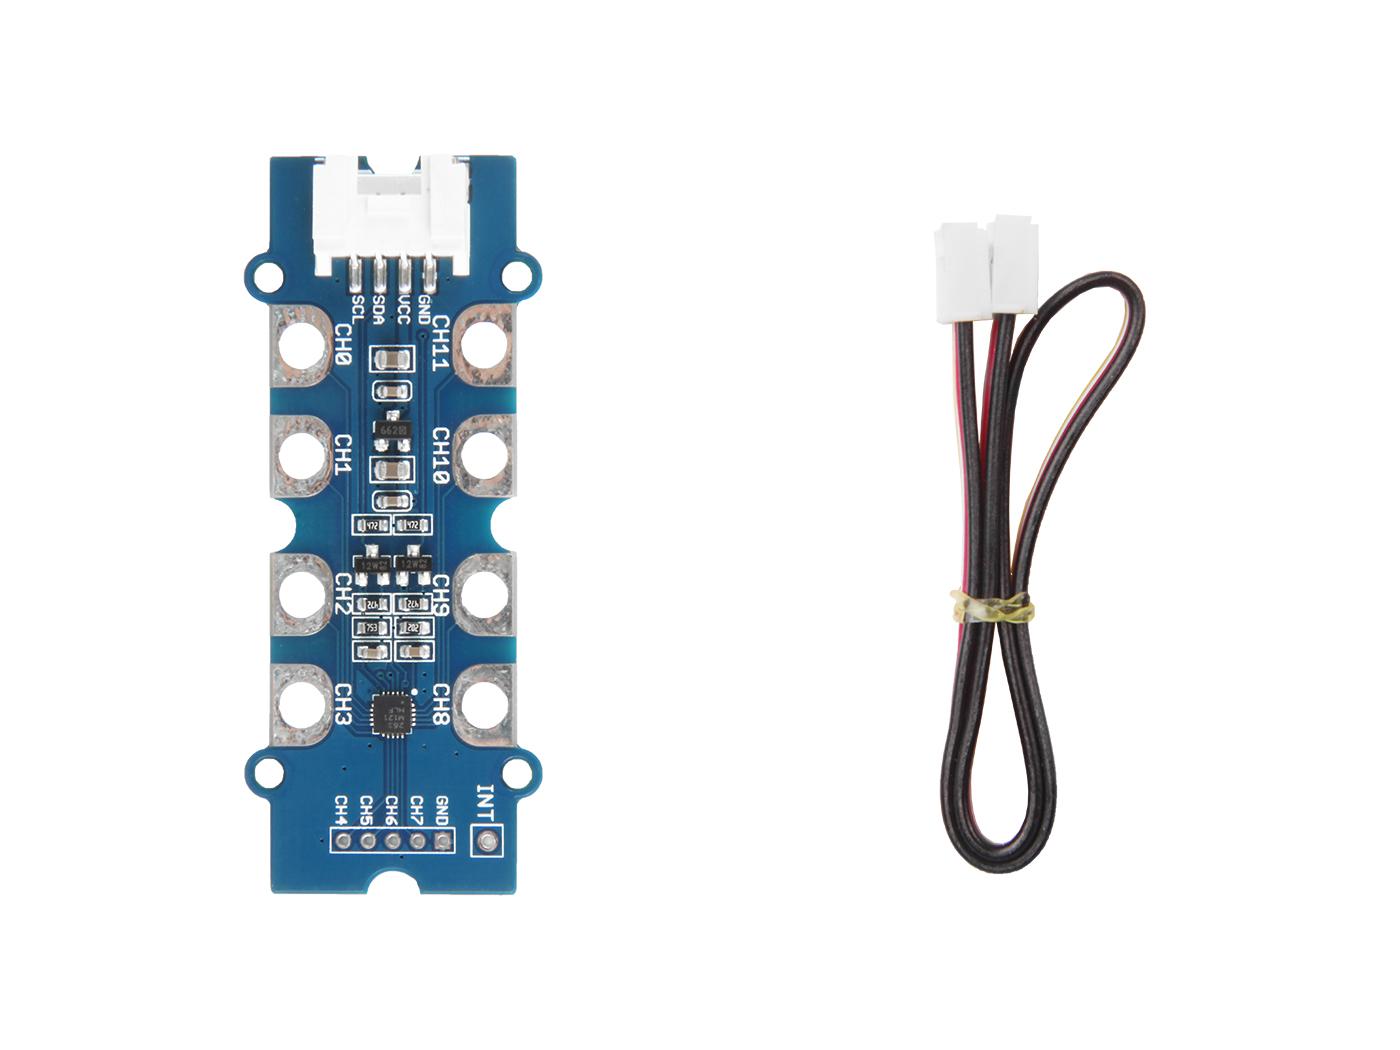 Grove - 12 Key Capacitive I2C Touch Sensor V2 (MPR121)